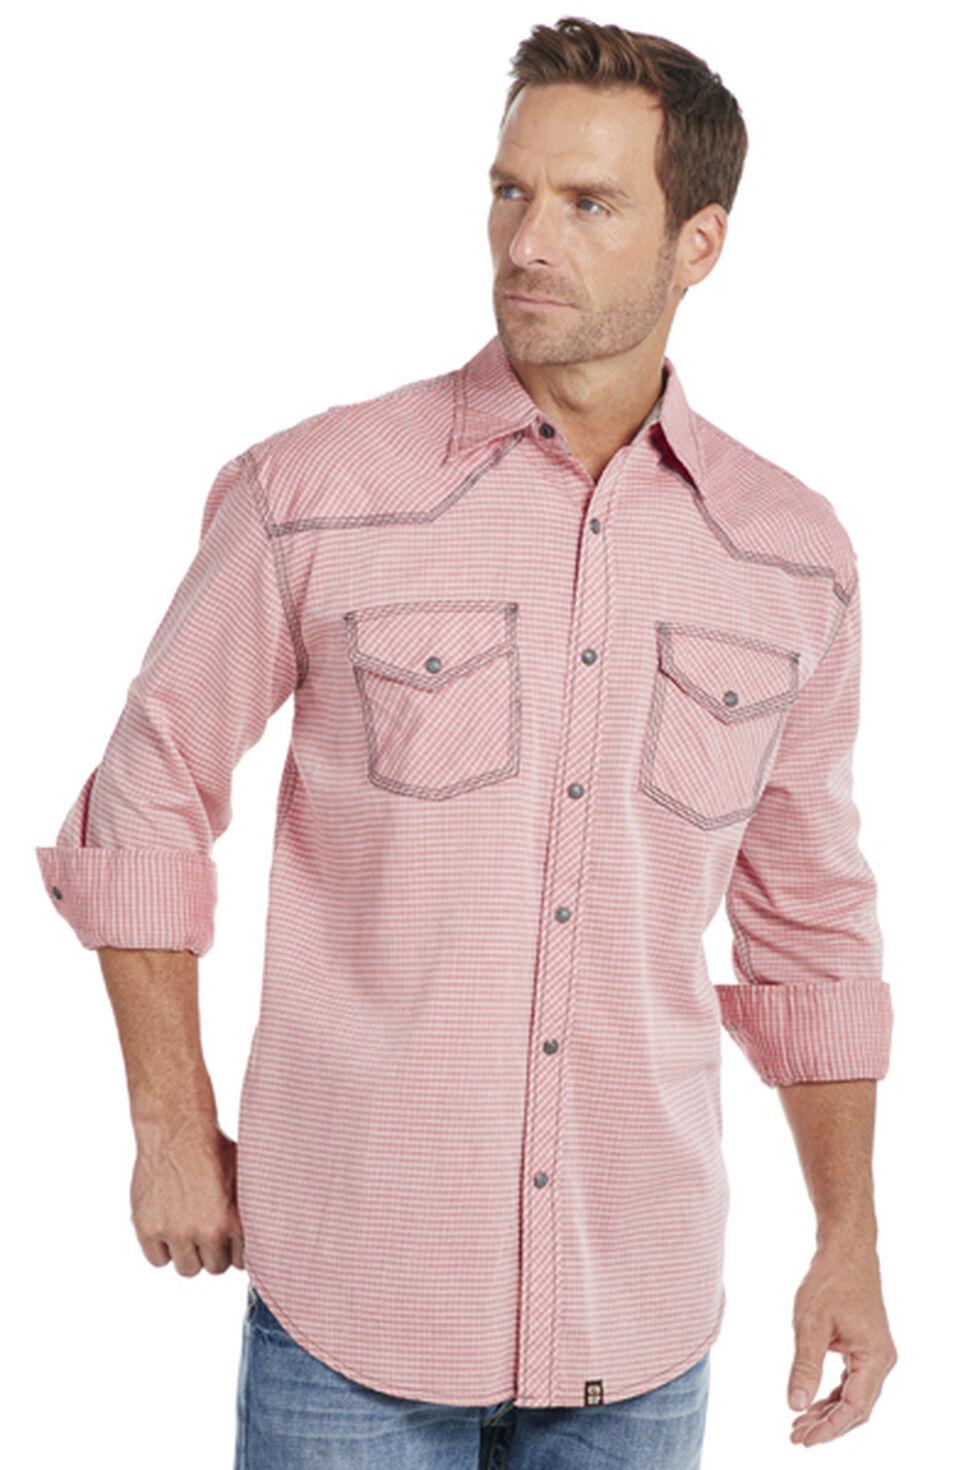 Cowboy Up Men's Red Plaid Snap Shirt, Red, hi-res